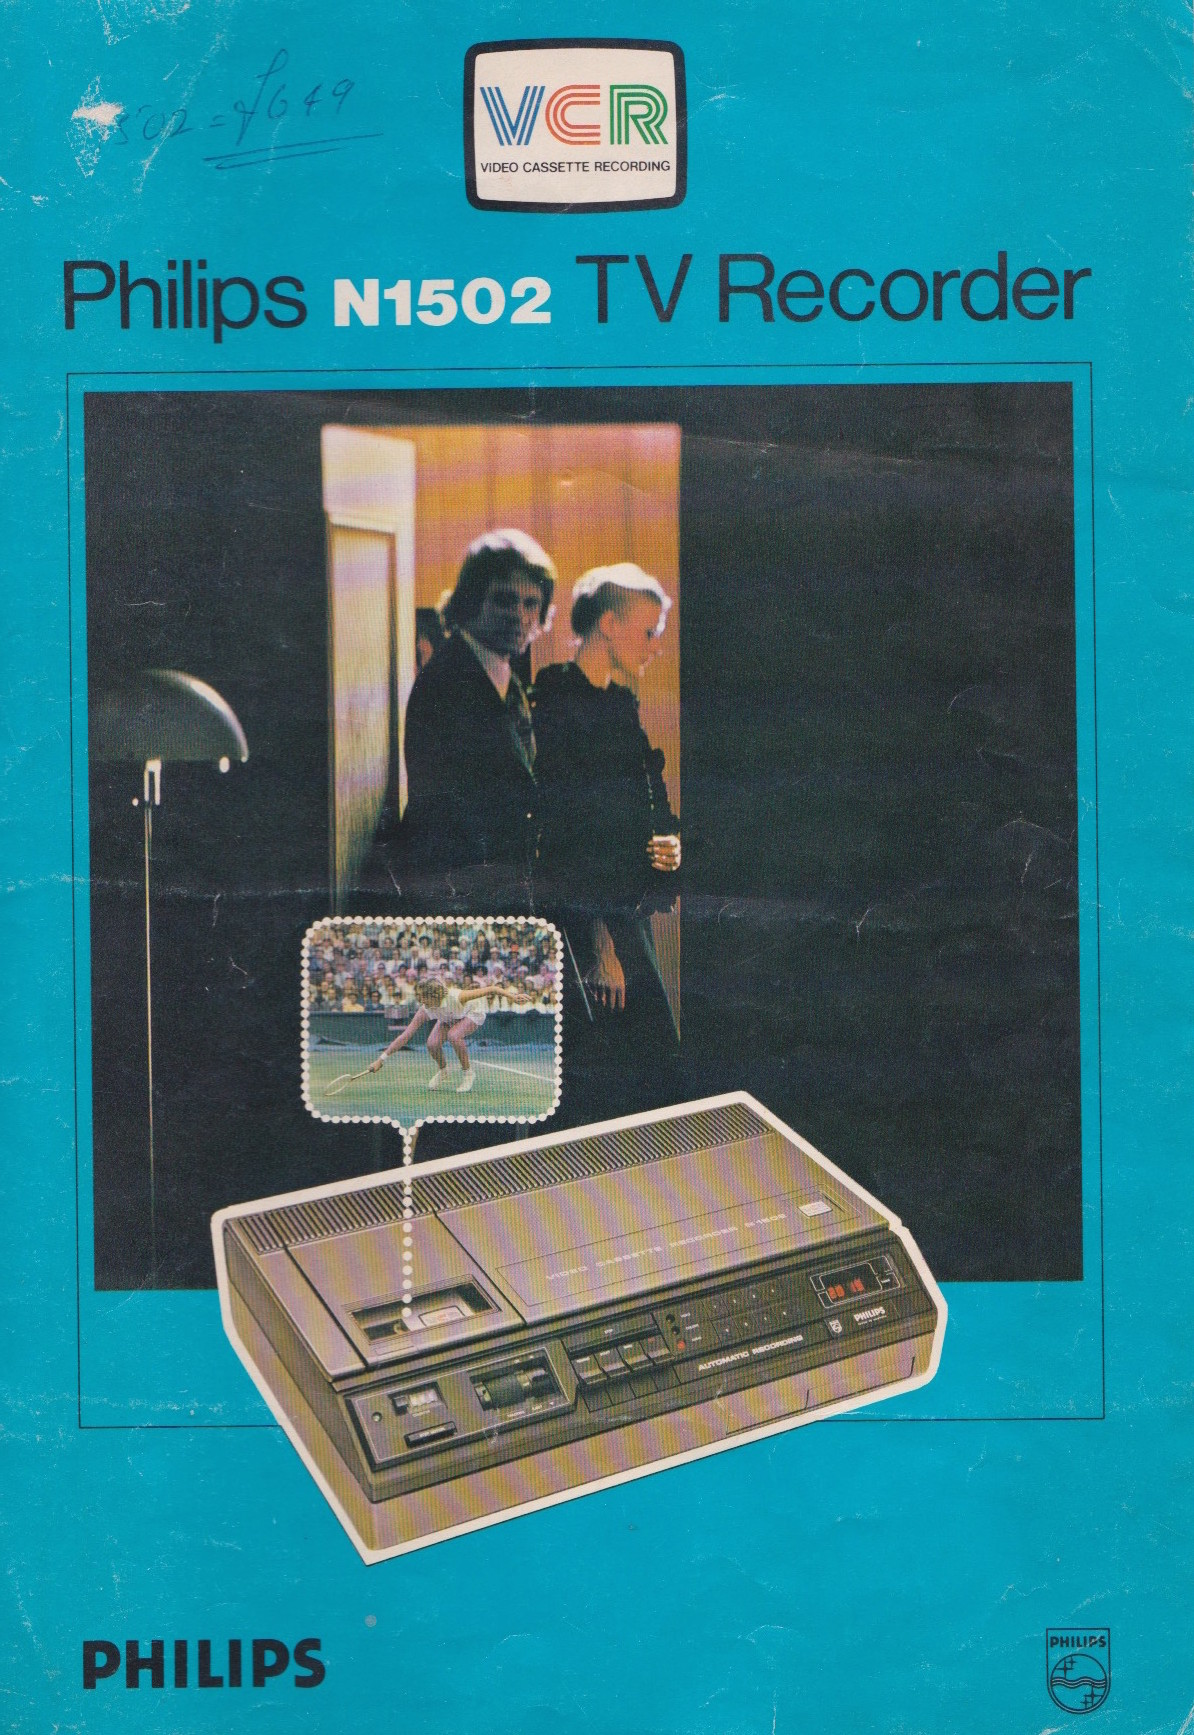 Philips N-1502 TV Recorder